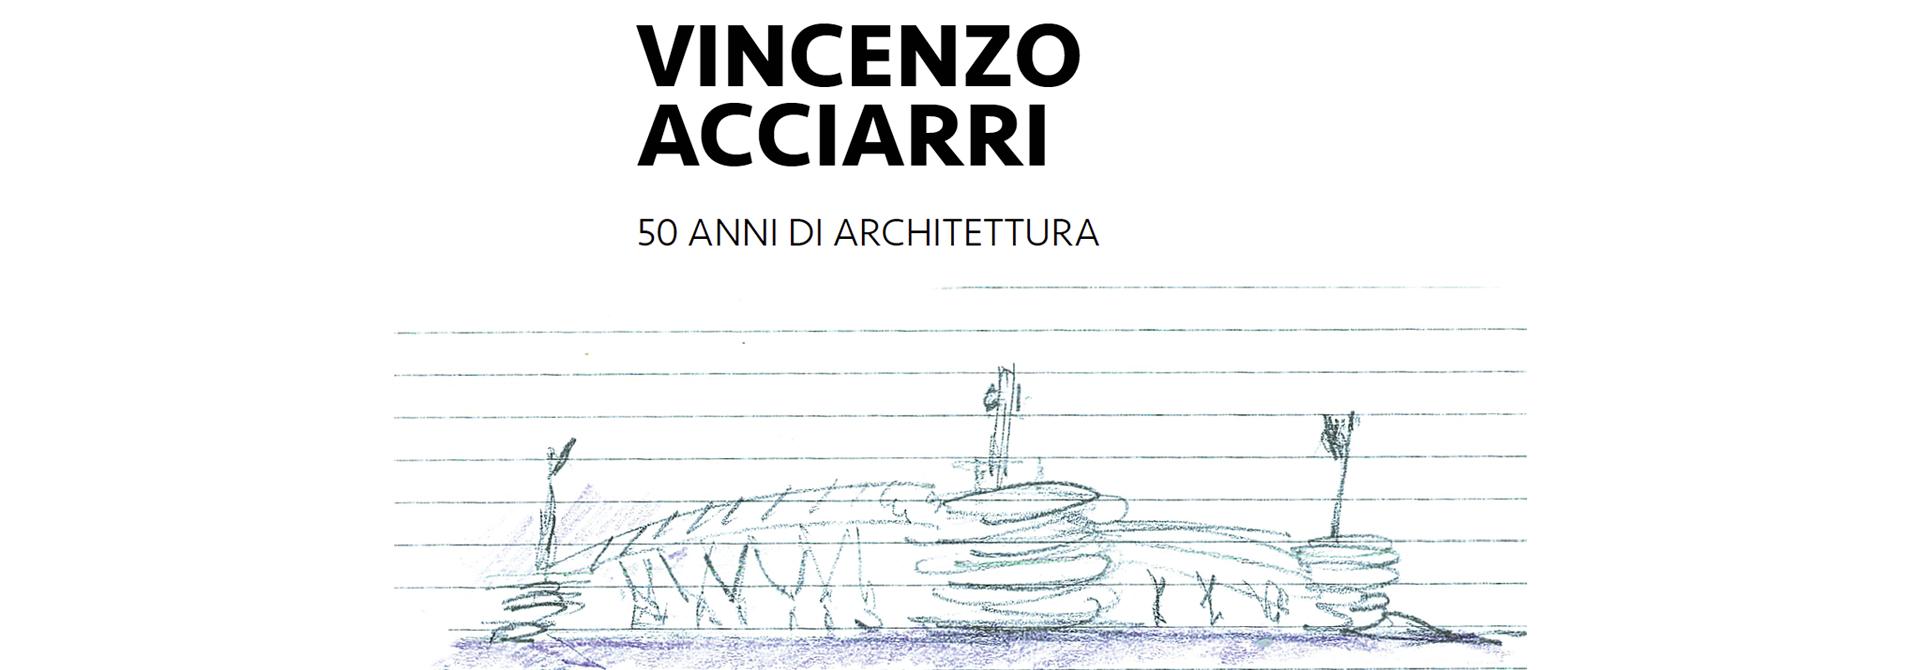 Slider Vincenzo Acciarri Mostra - Ordine Architetti Ascoli